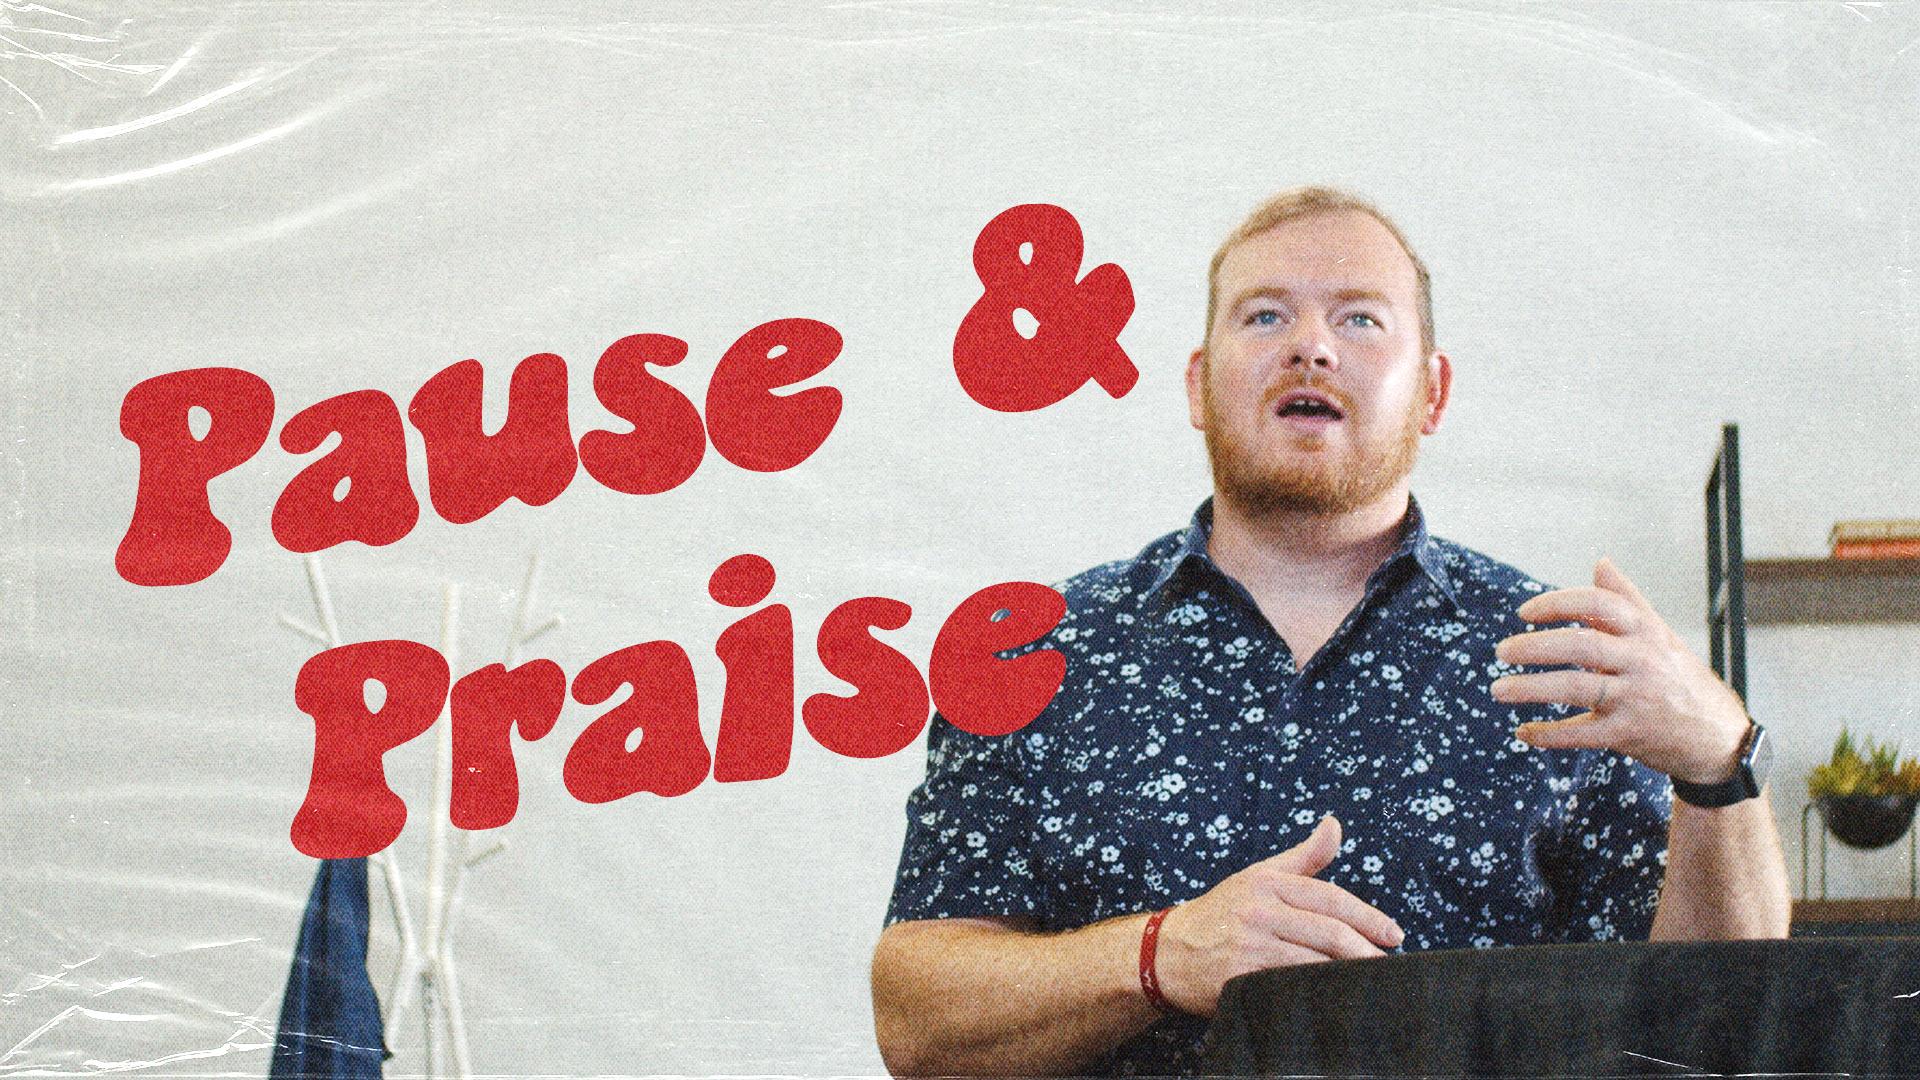 Pause & Praise